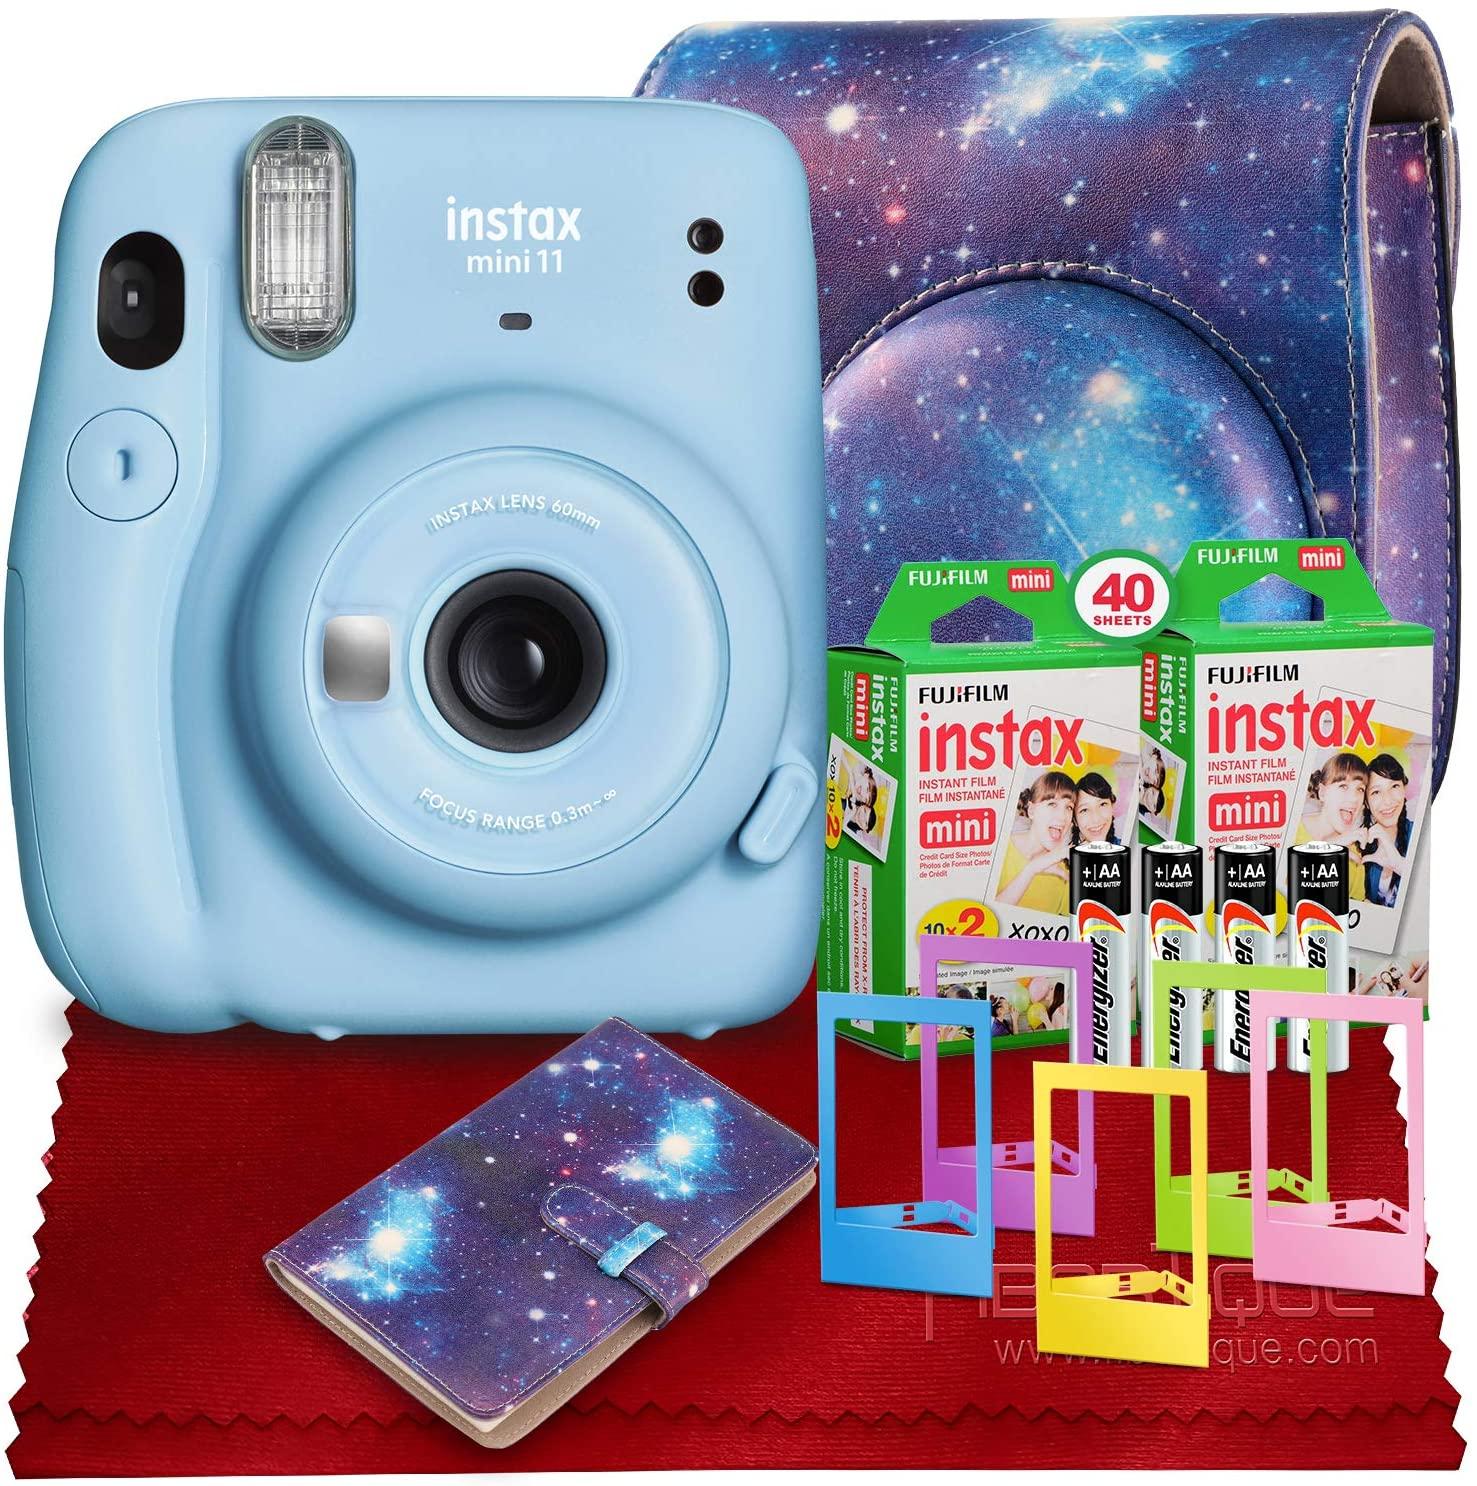 PS FUJIFILM INSTAX Mini 11 Instant Film Camera (Sky Blue) with Fujifilm Instax Mini Twin Film (40 Exposures), Accessory Case, and Accessories Bundle